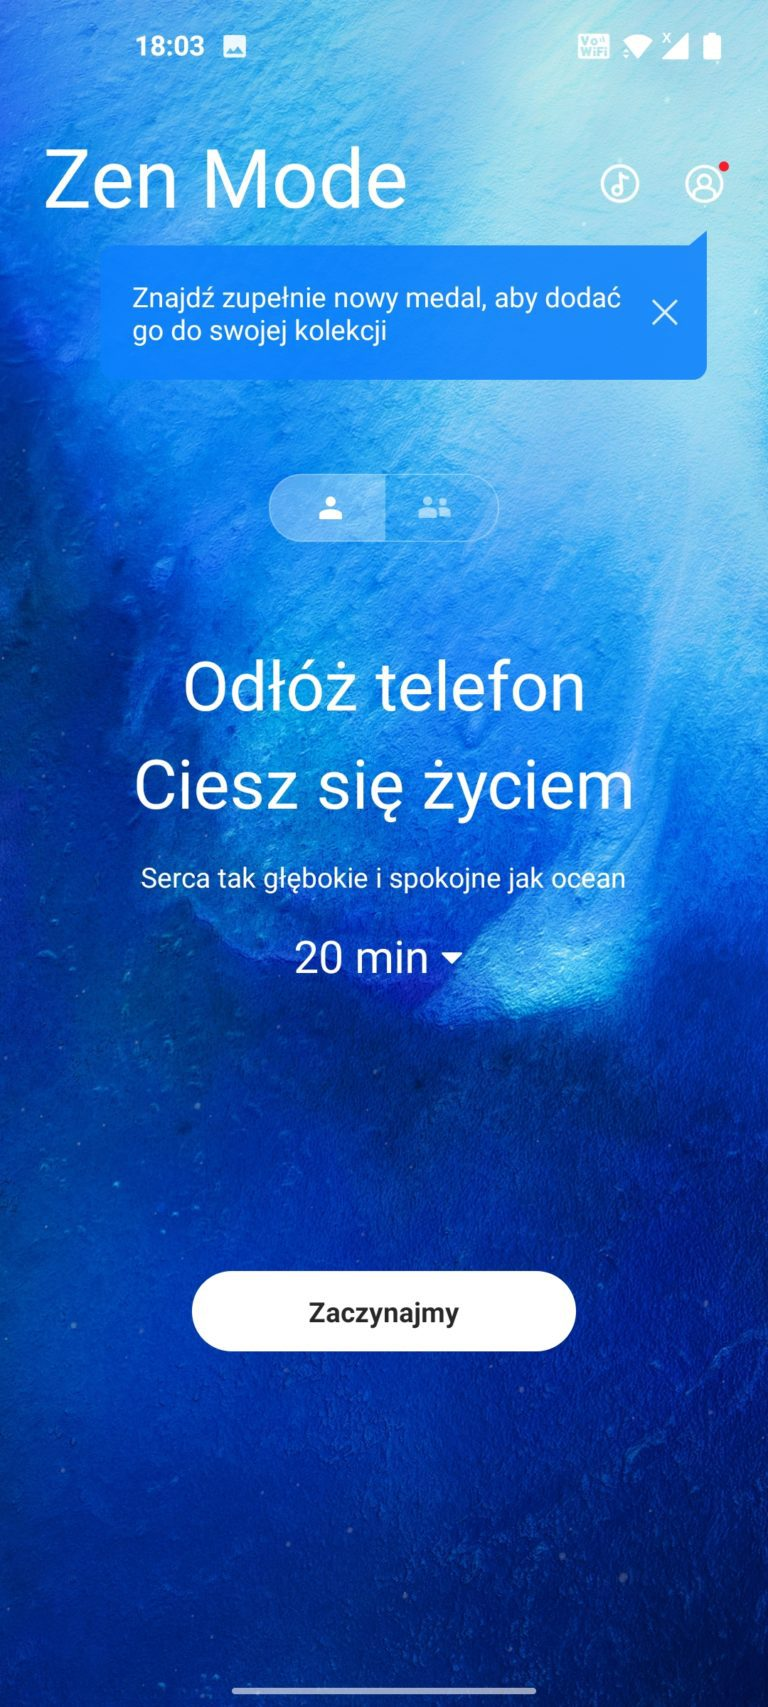 OnePlus Nord CE 5G Zen Mode